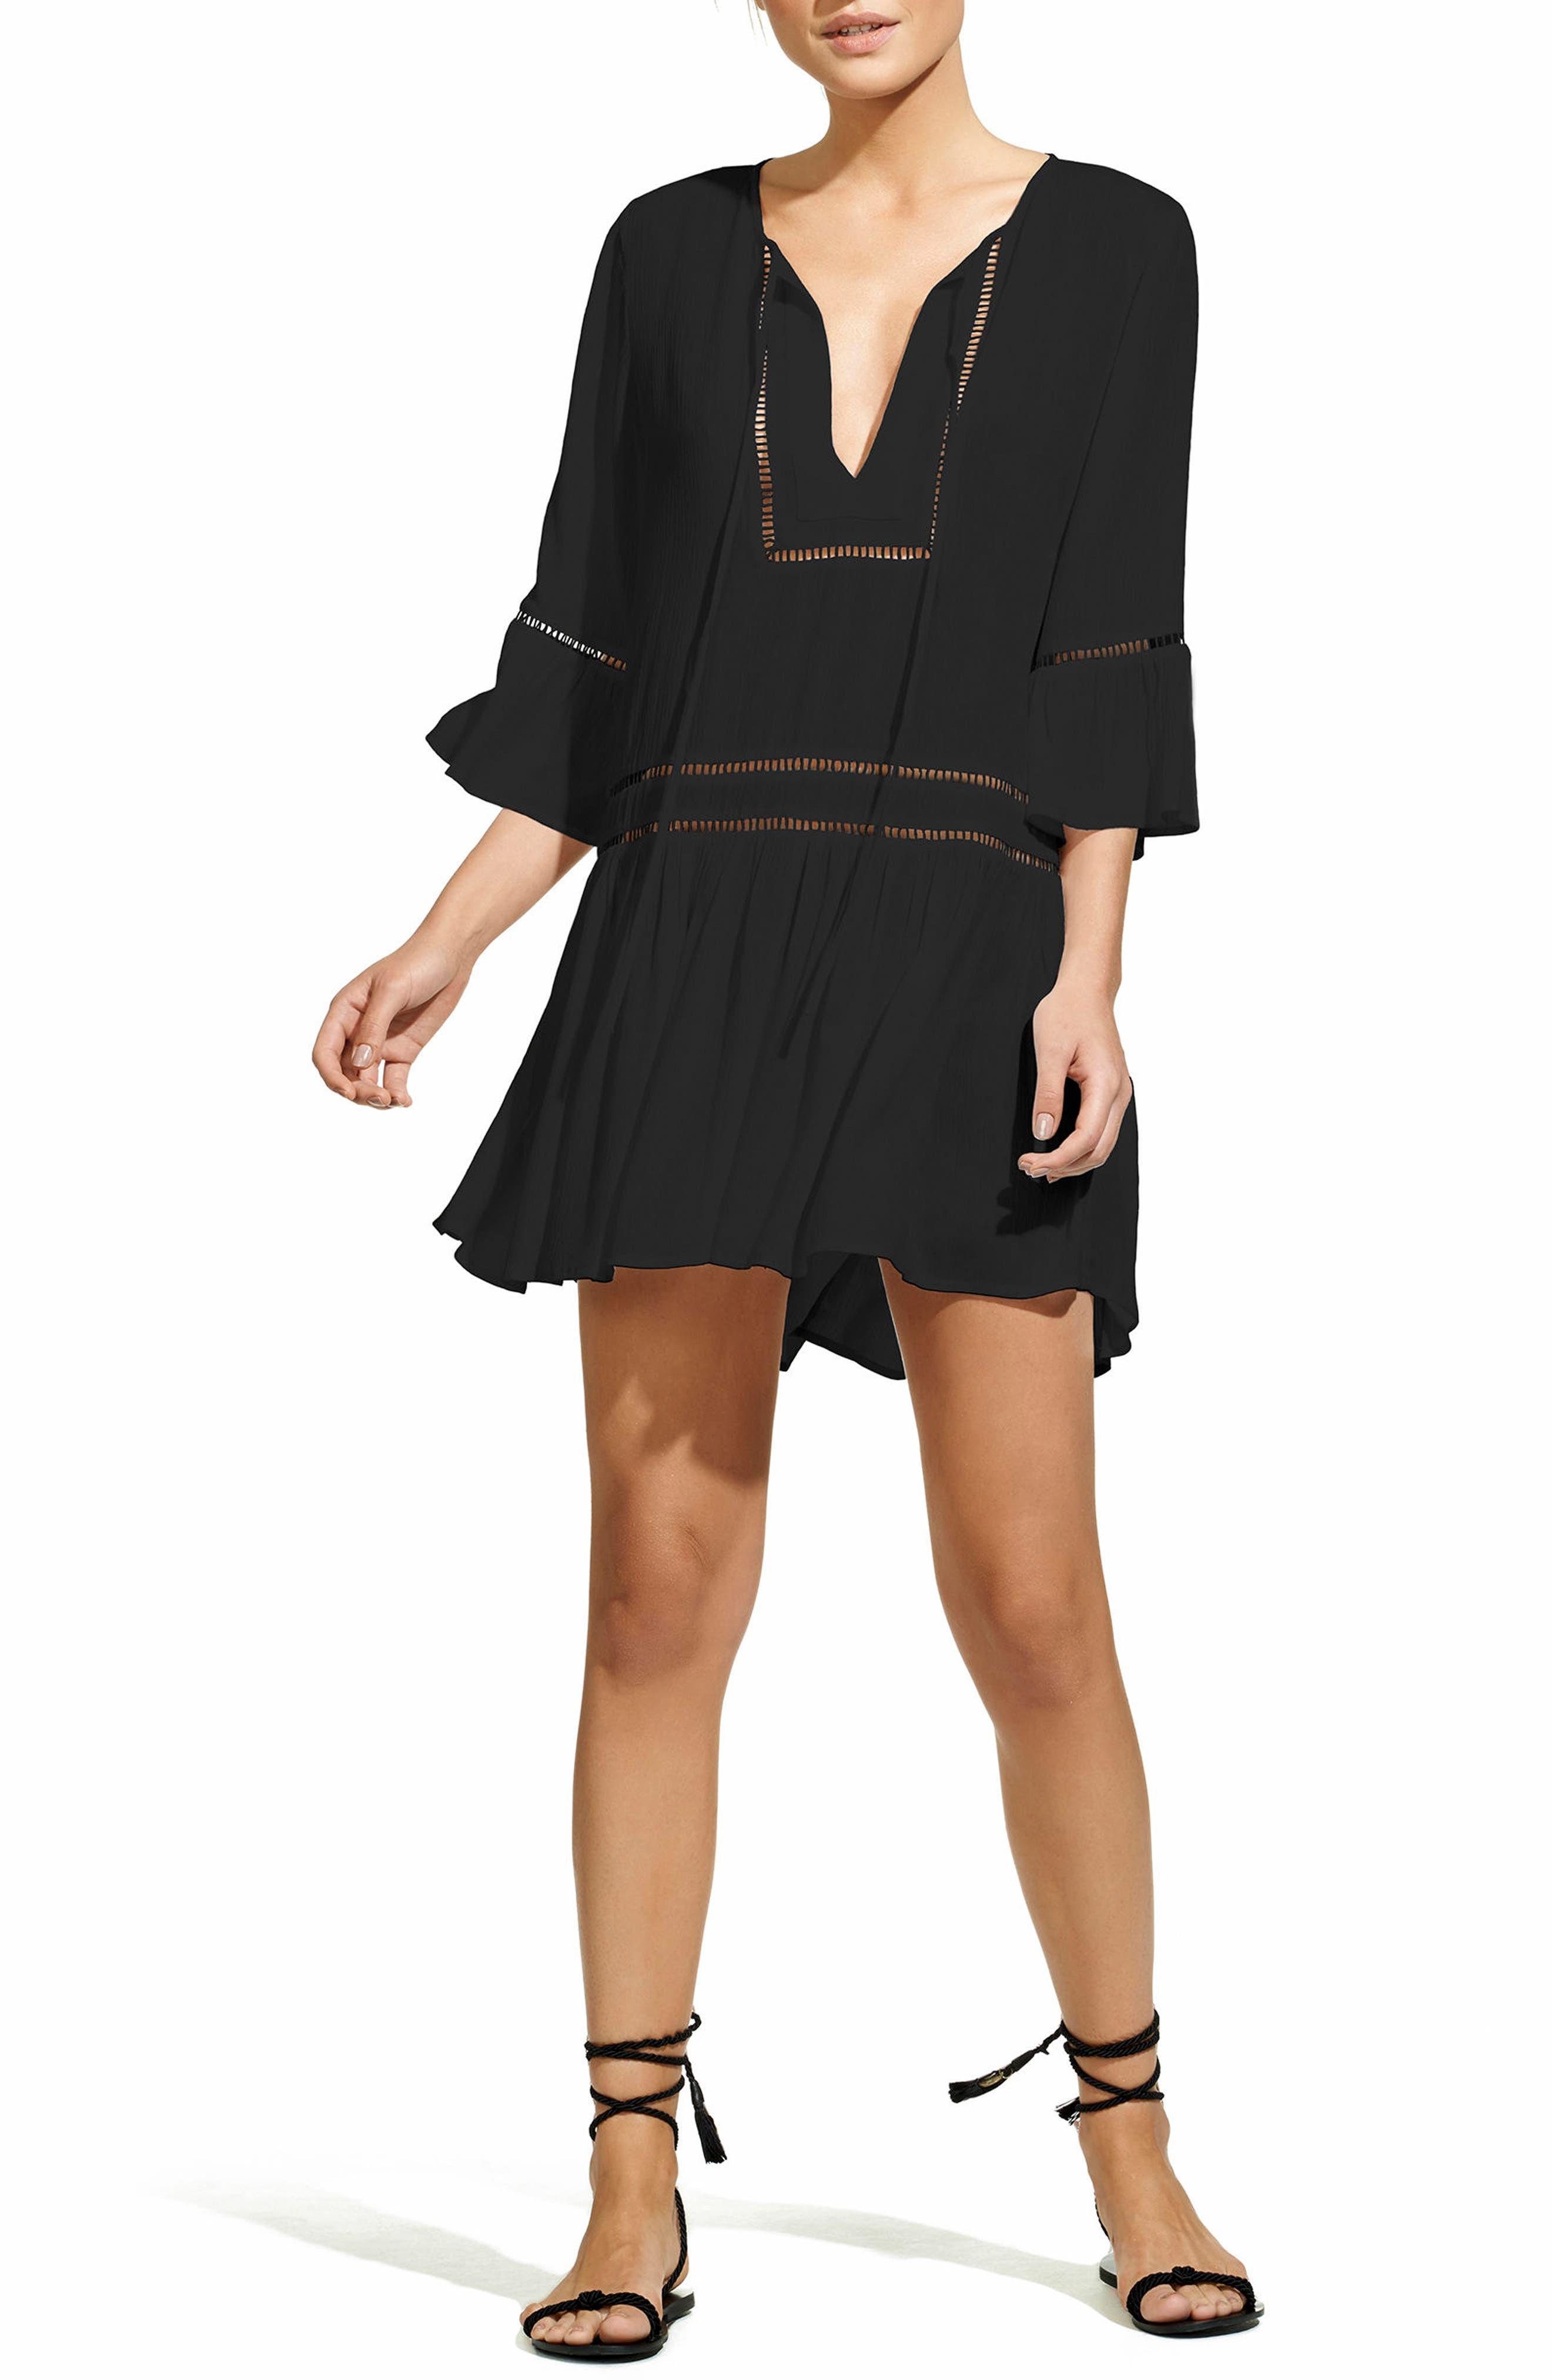 VIX SWIMWEAR, Agatha Cover-Up Dress, Main thumbnail 1, color, 001